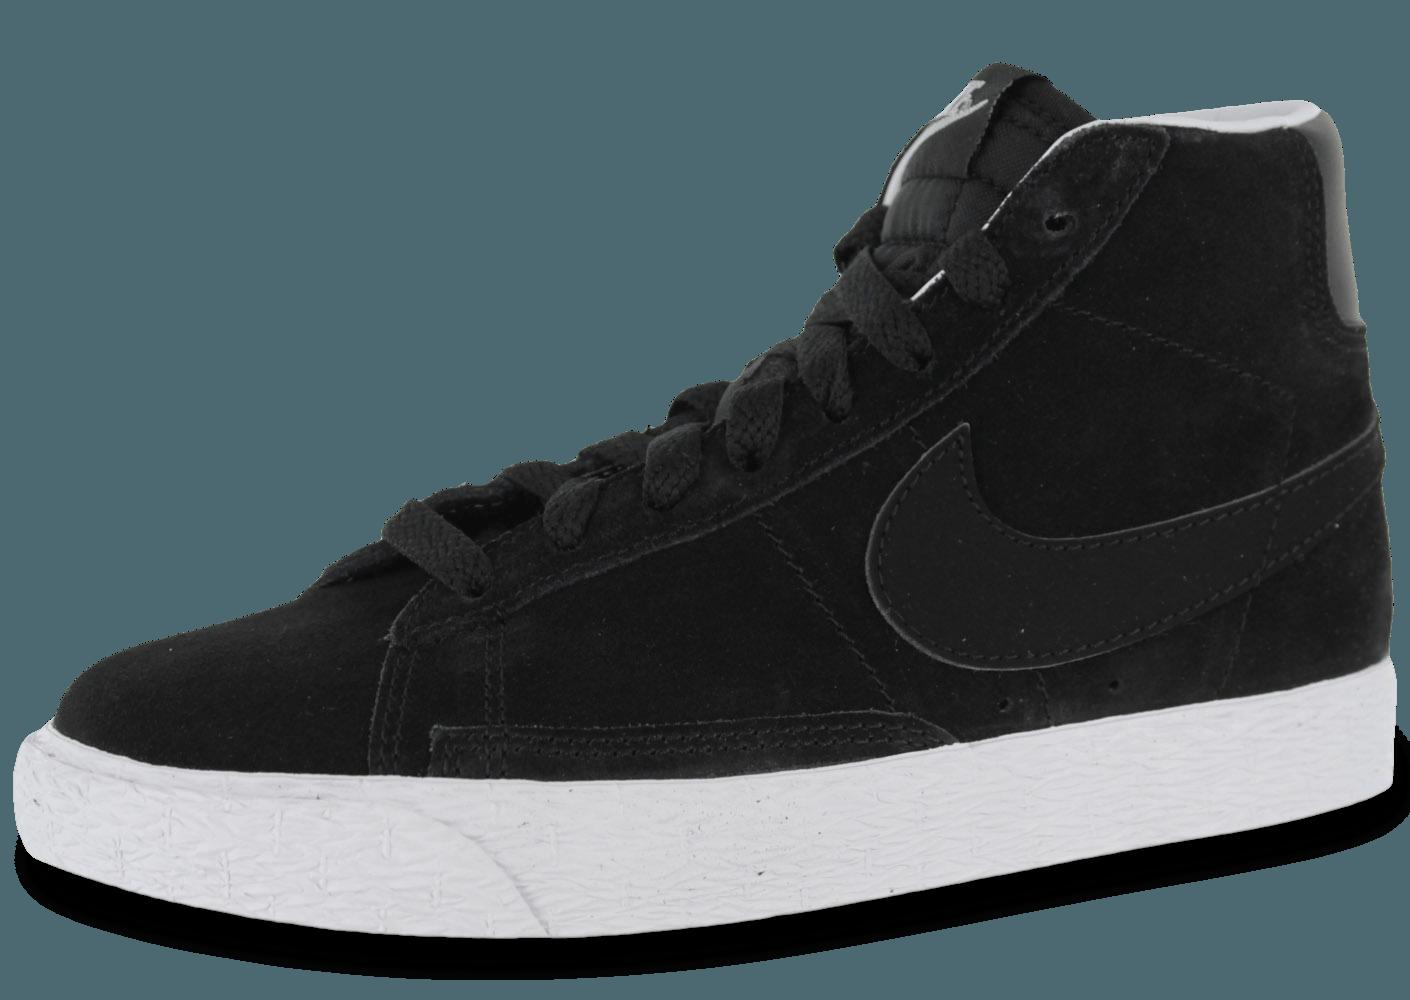 Daim Blazer Noir Nike Chers Enfant Vente Livraison Gatorade Pas Vert AqXSxf